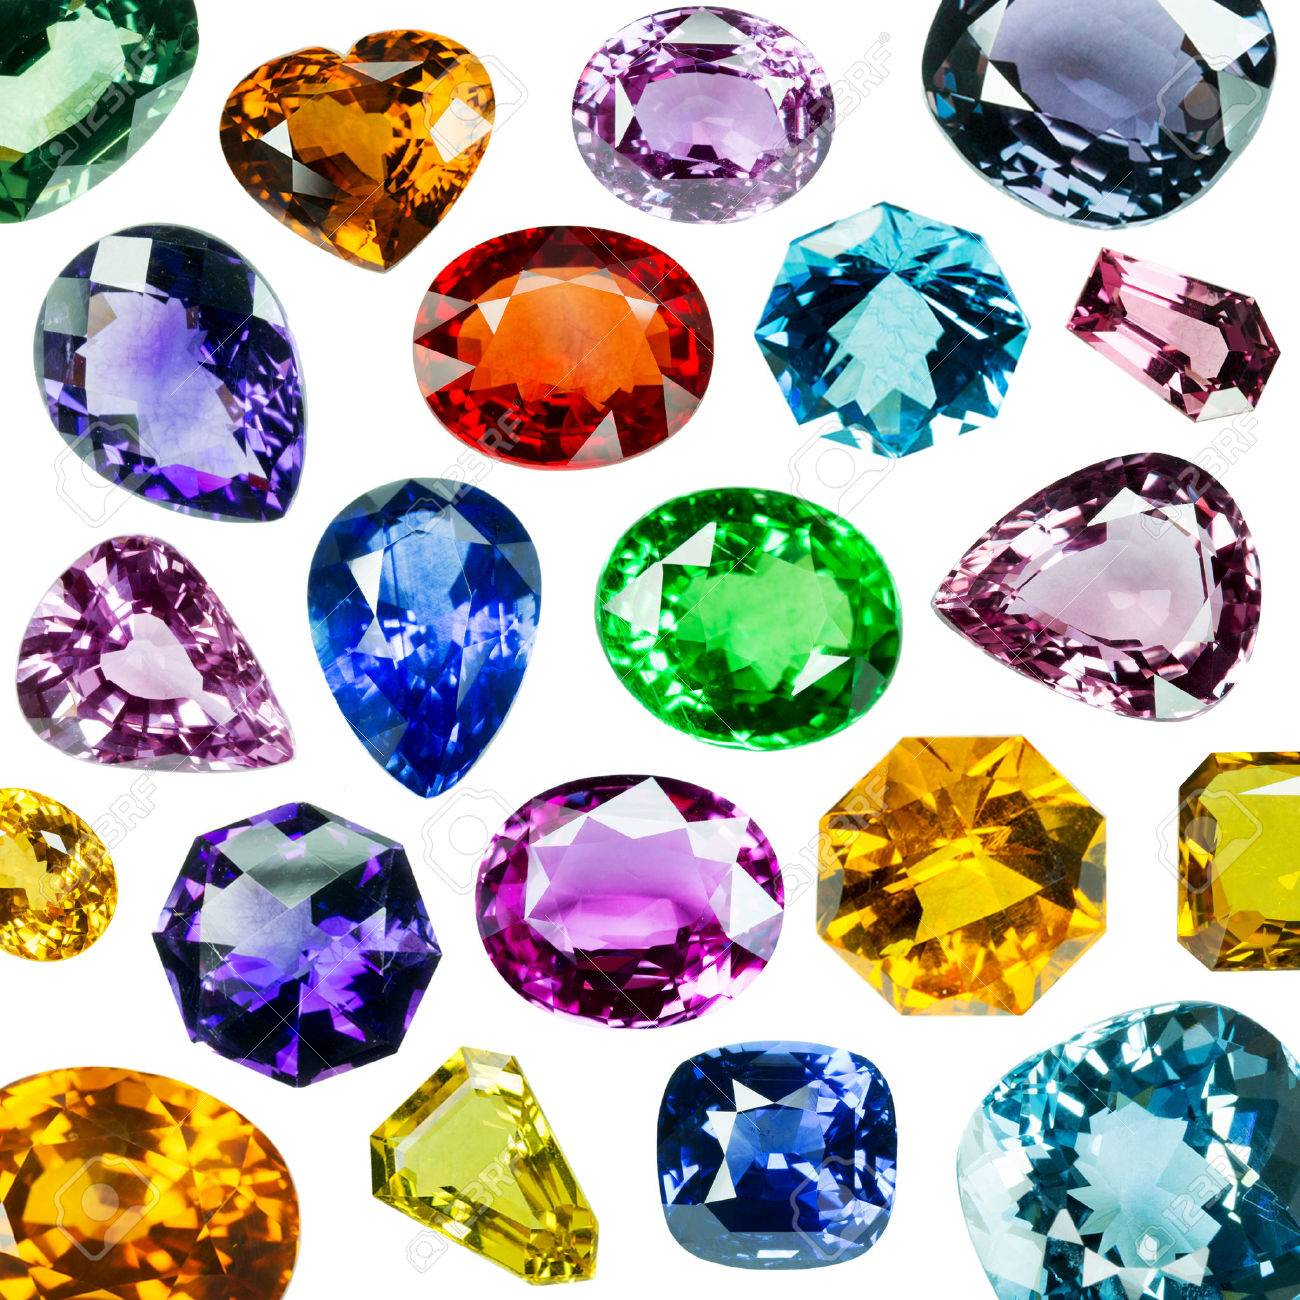 Bright gems isolated on white background Stock Photo - 24295244